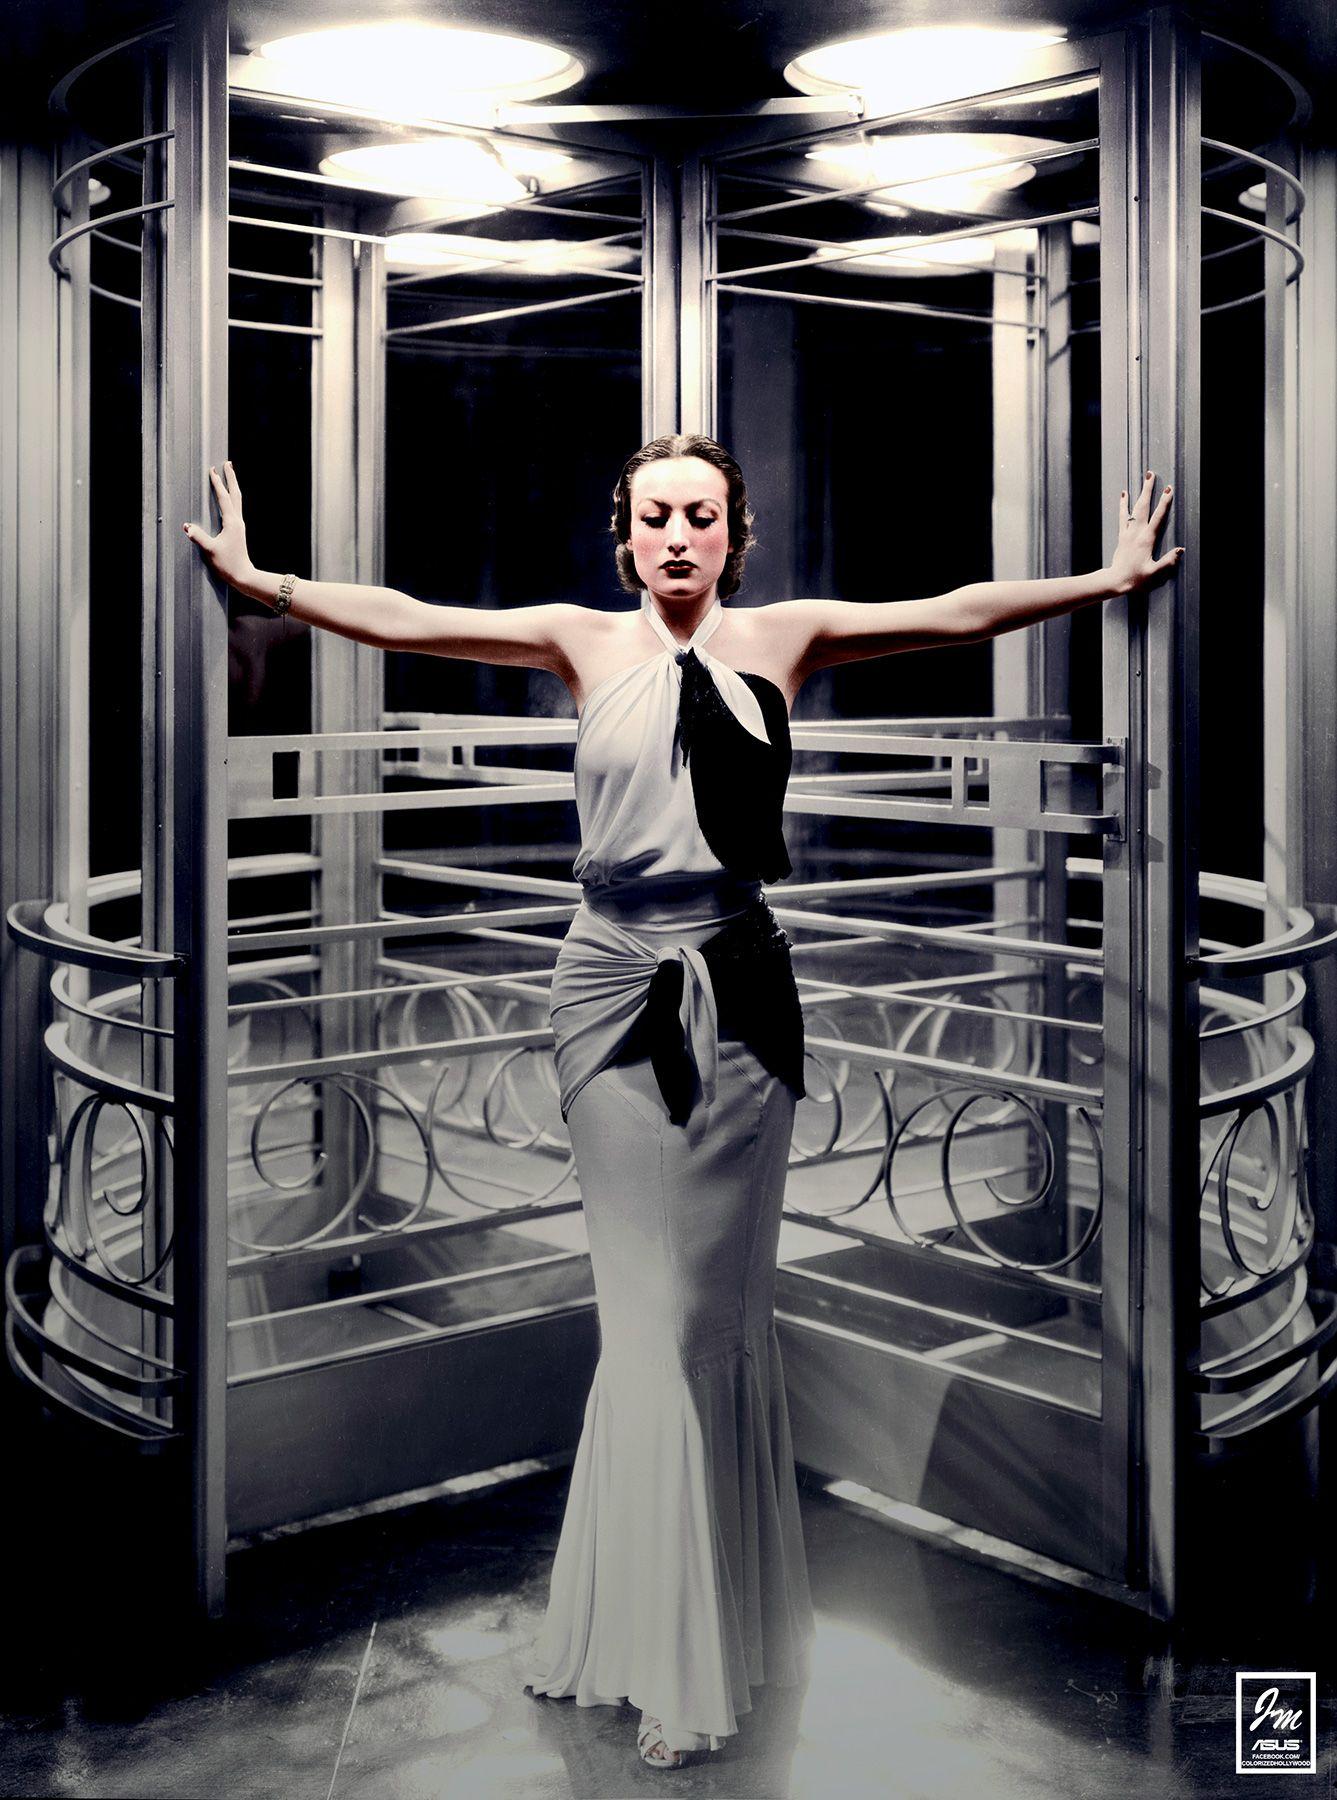 Joan Crawford Grand Hotel 1932 In